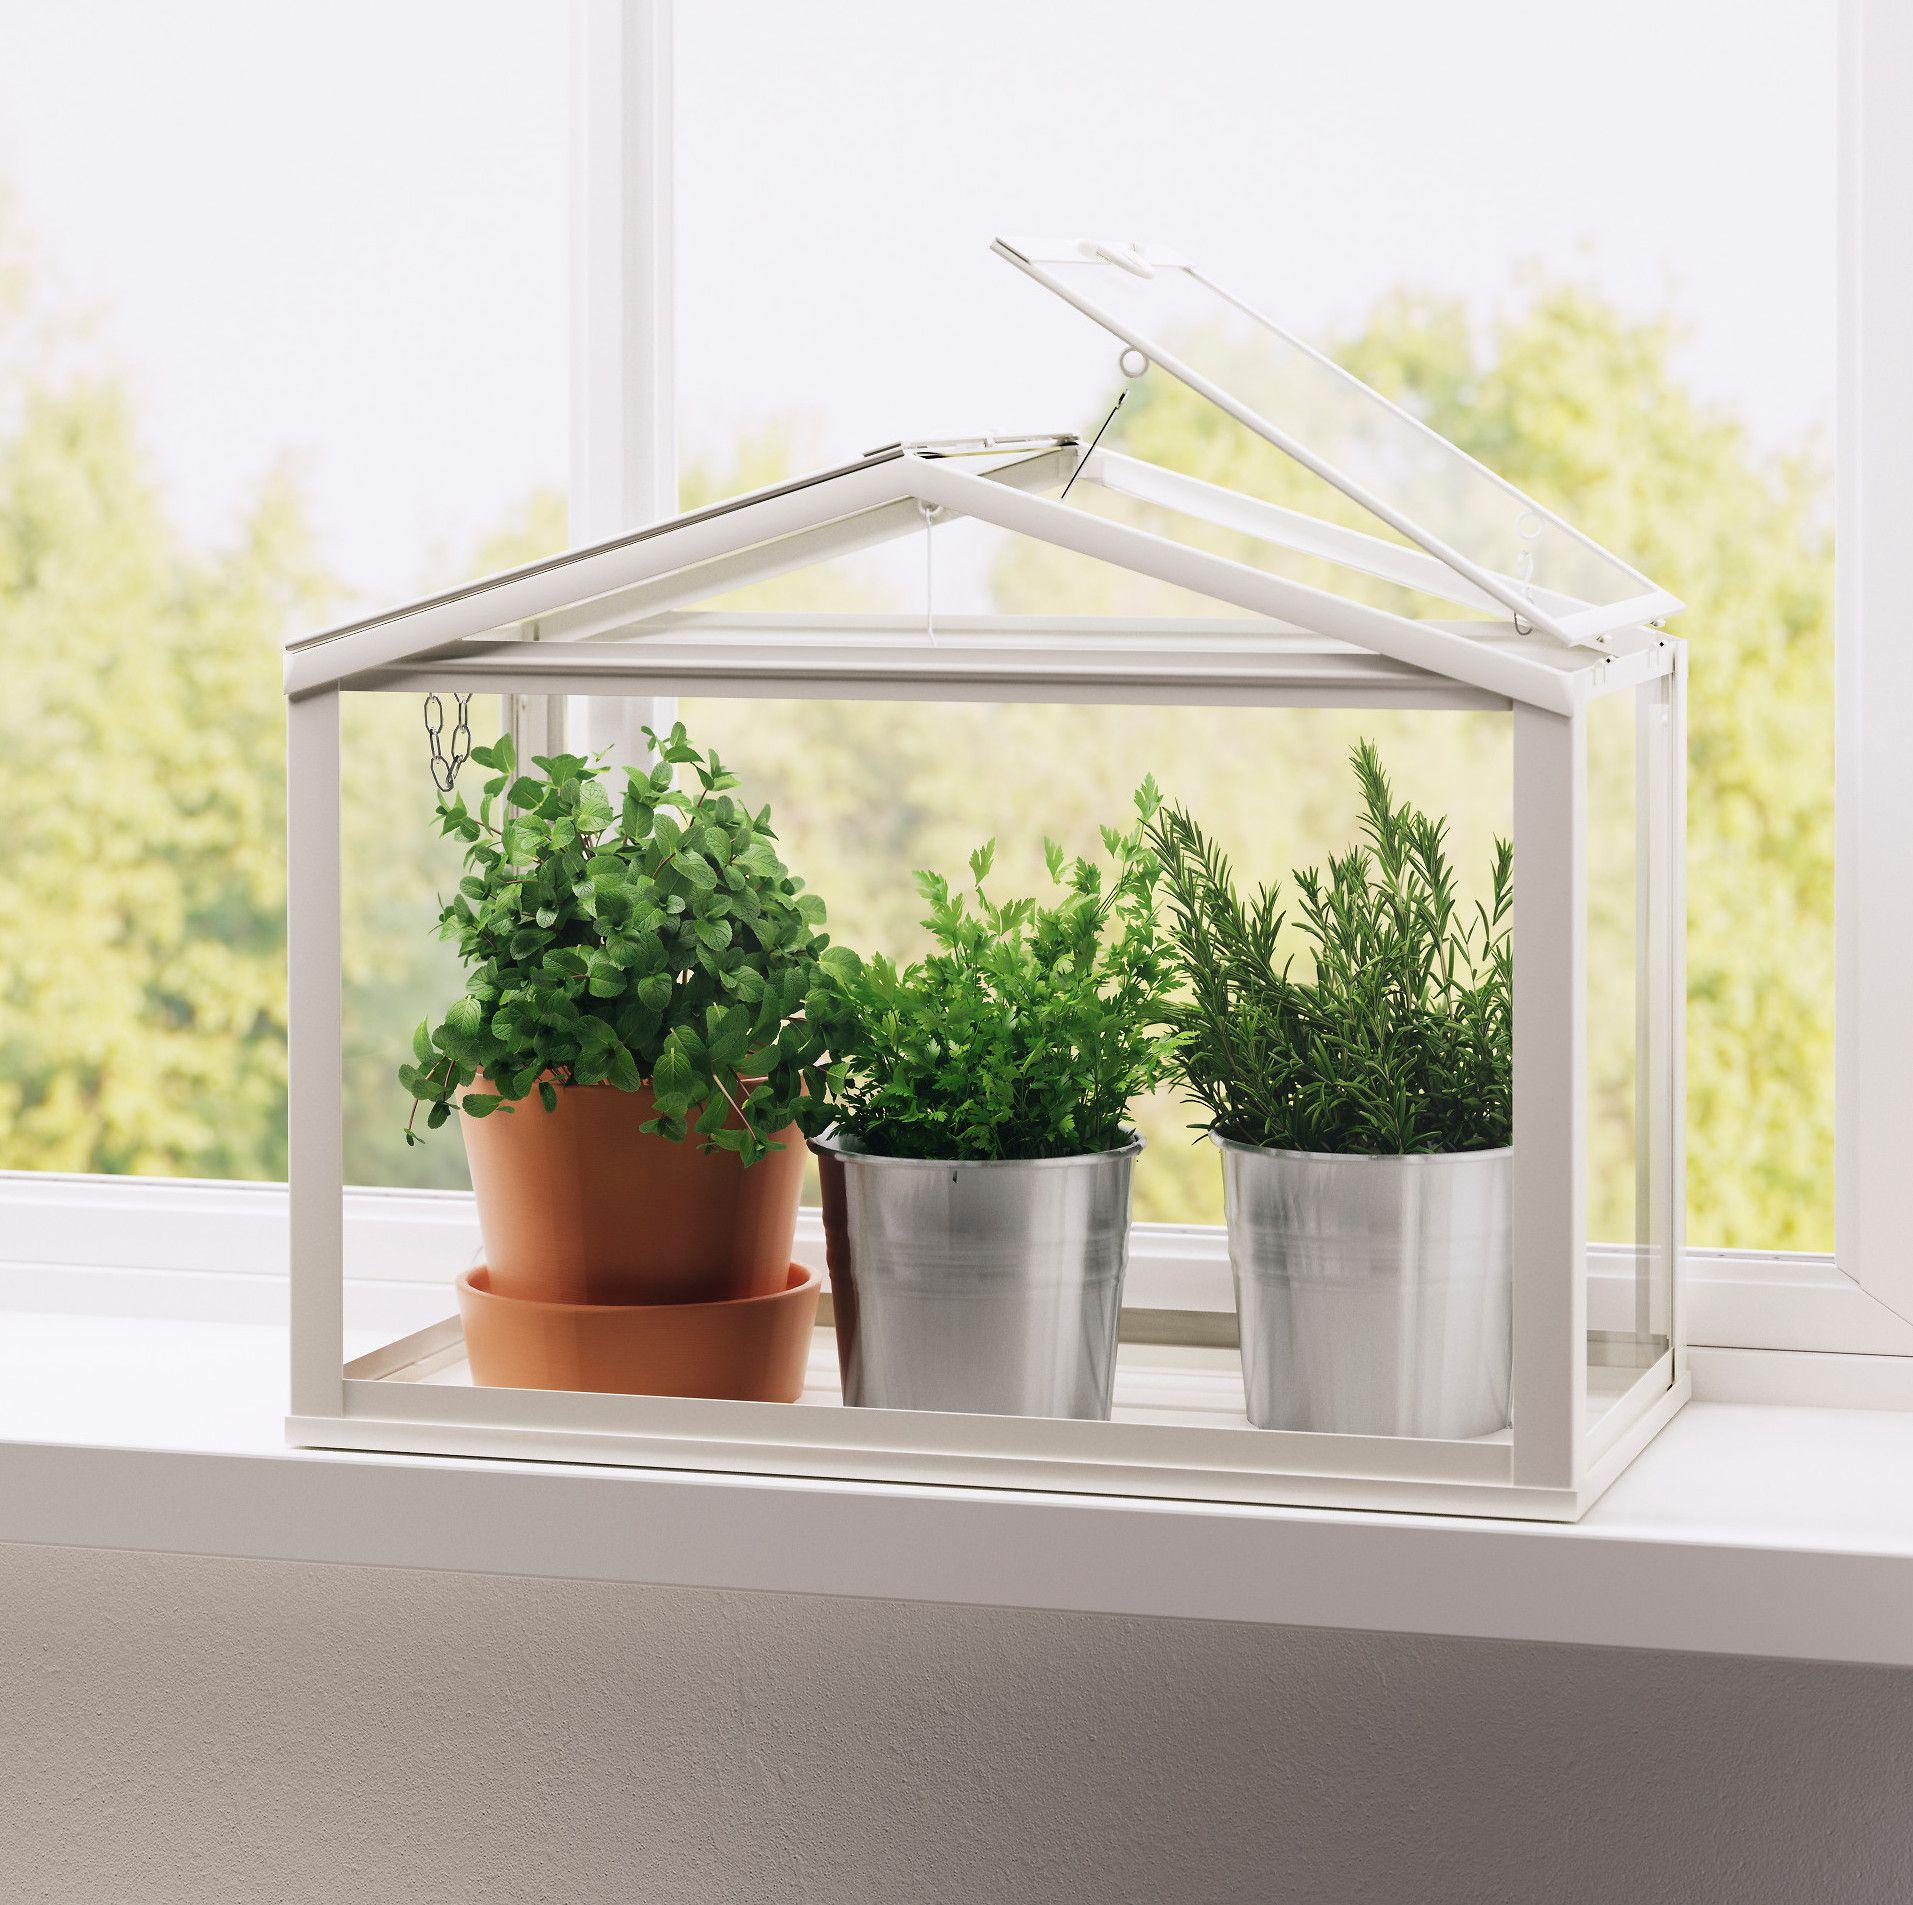 20 Best Indoor Plants - Good Inside Plants for Small Space Gardening